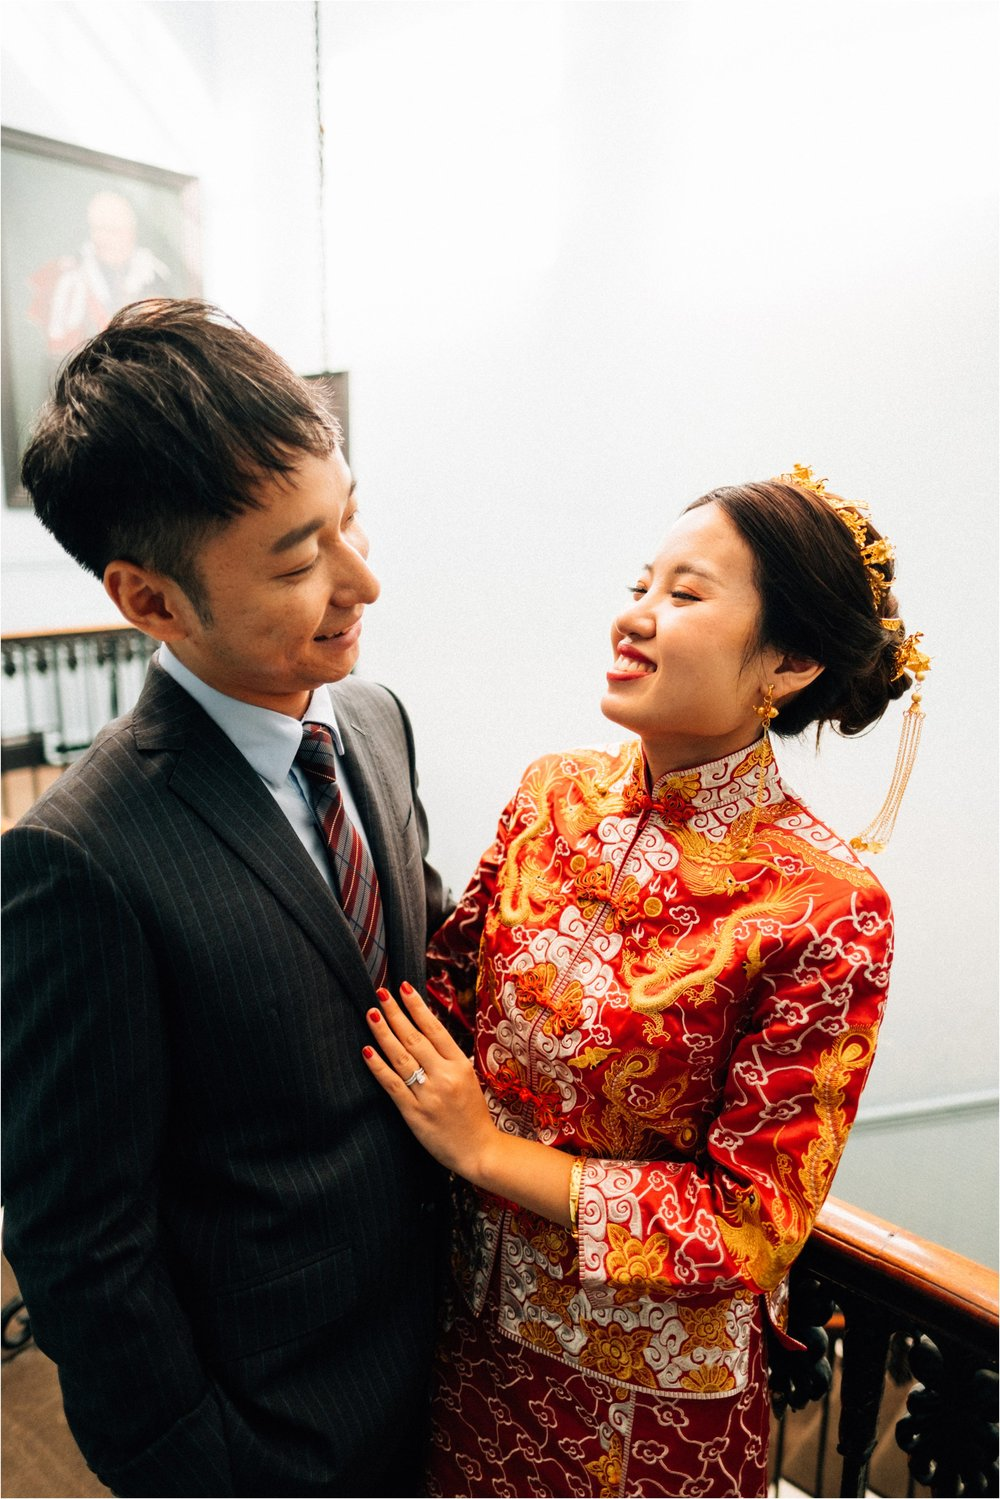 York city elopement wedding photographer_0174.jpg